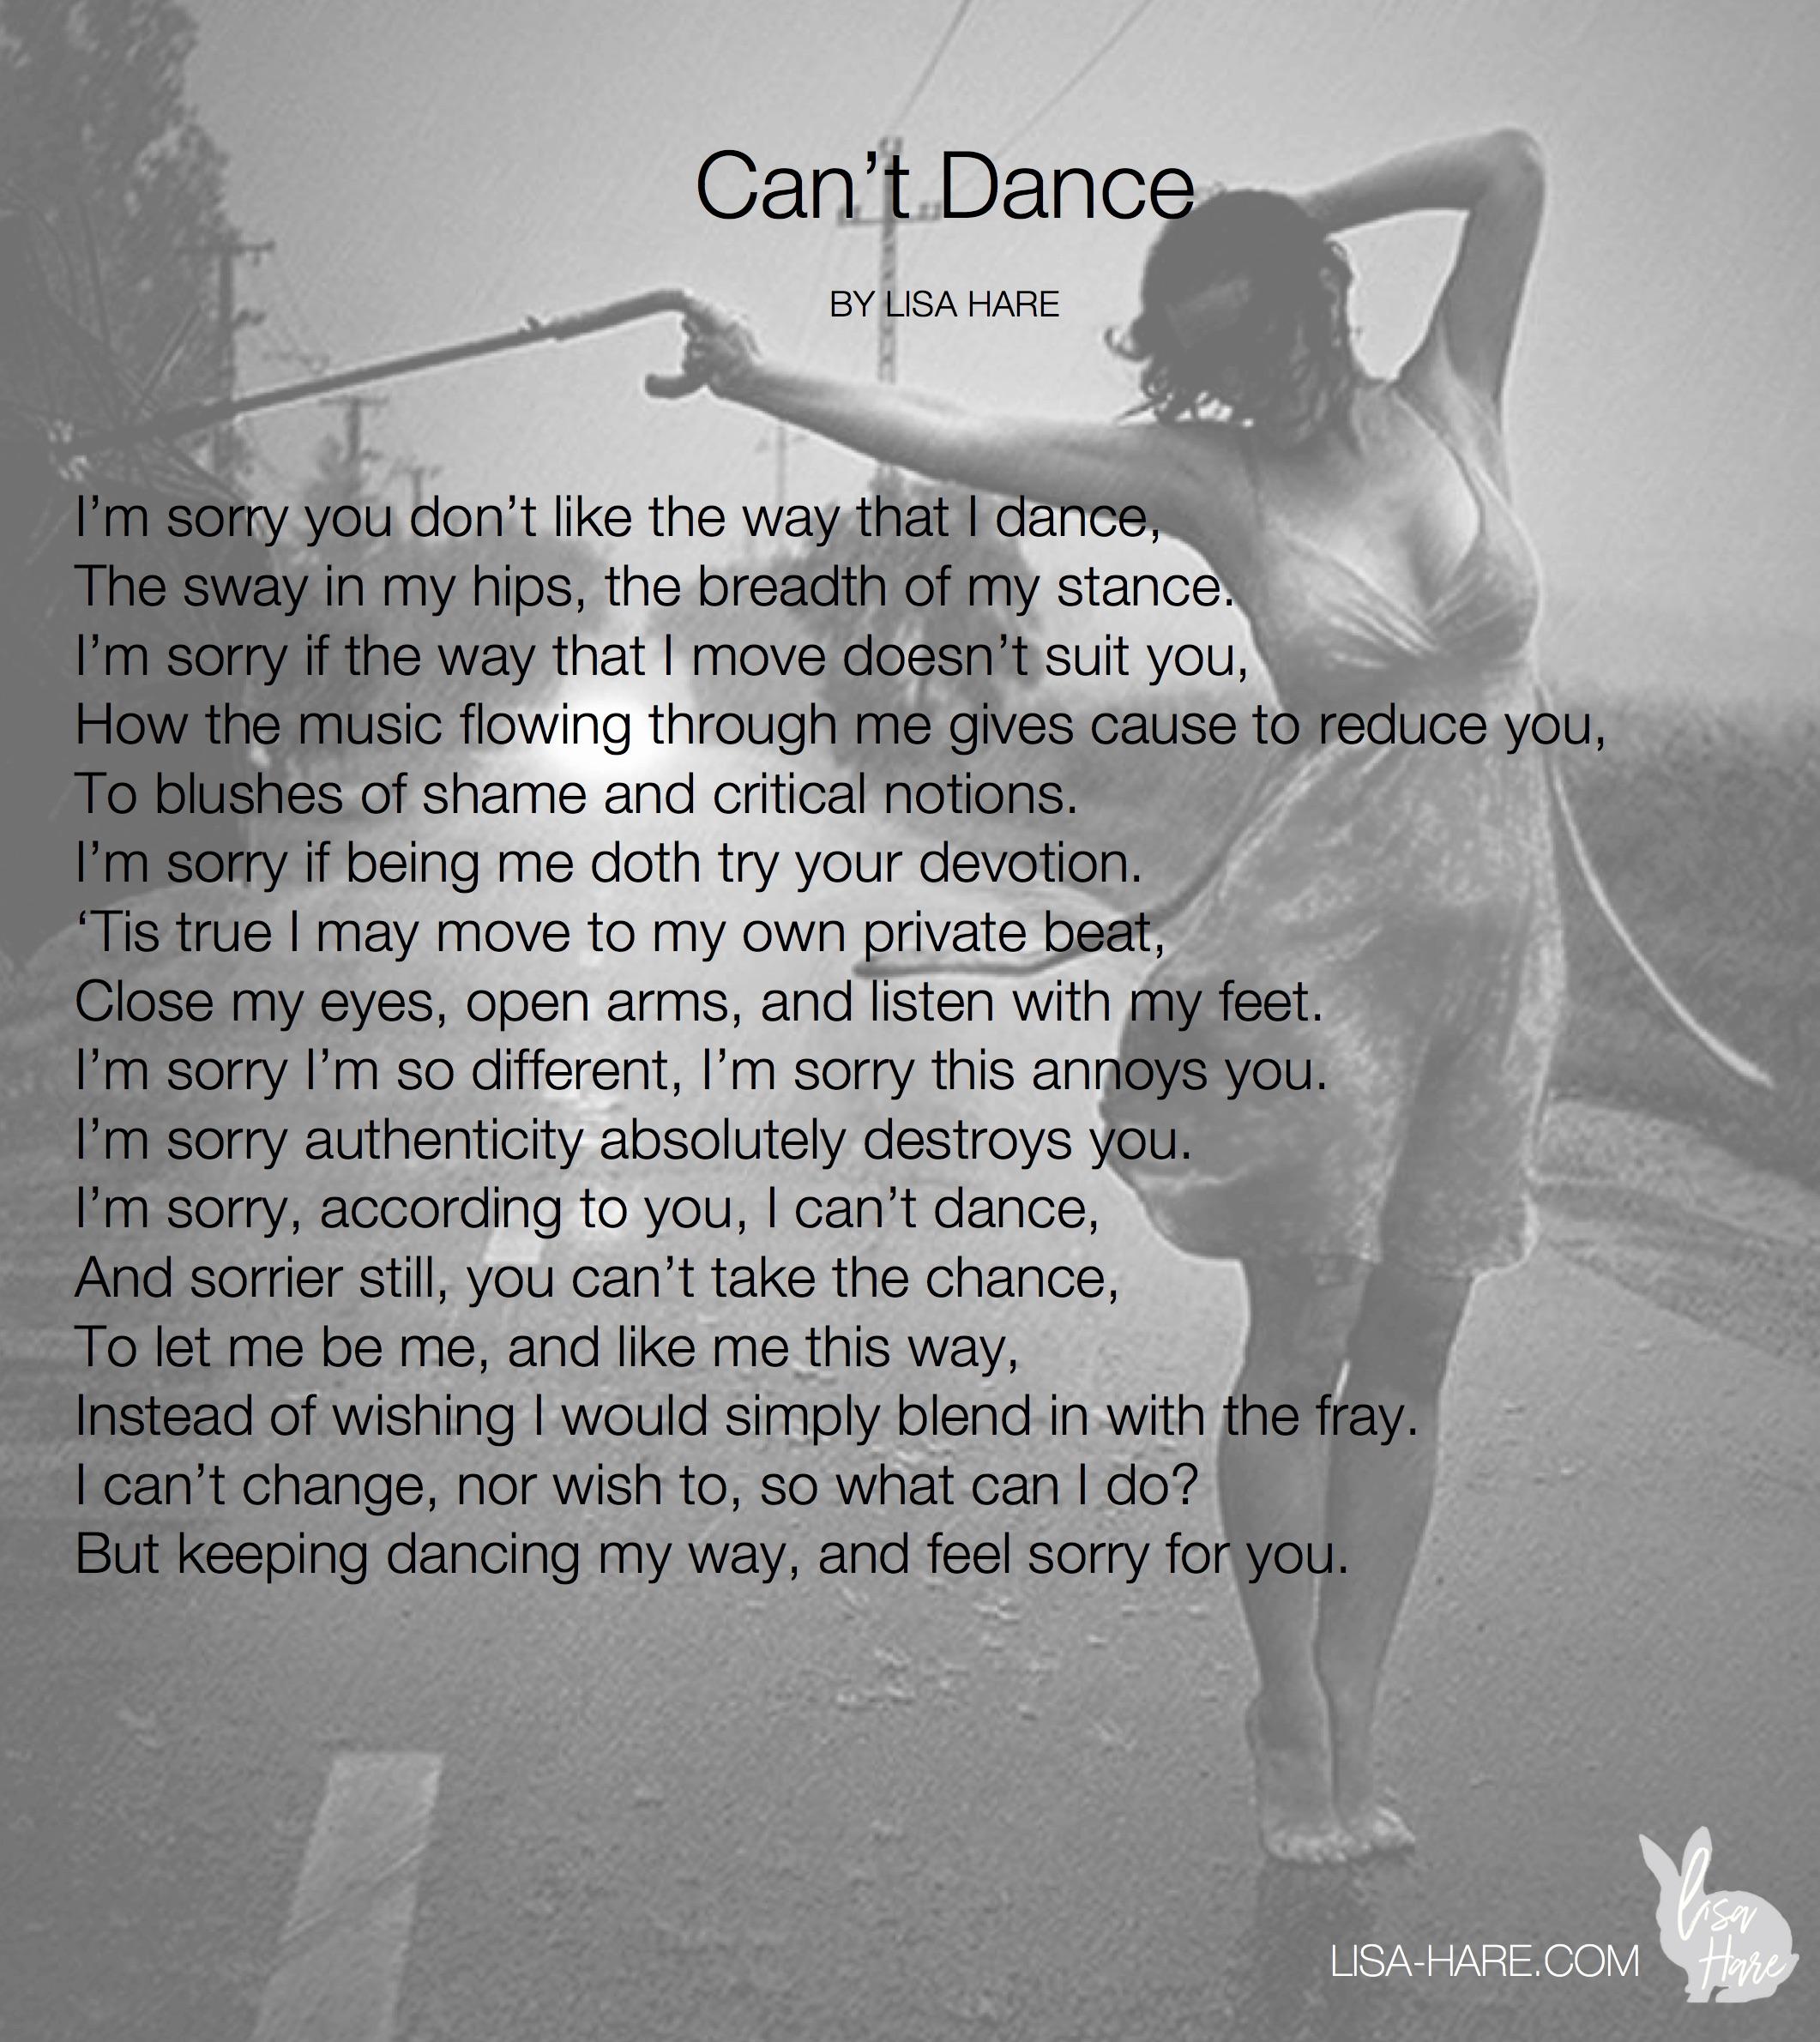 can't dance poem.jpg